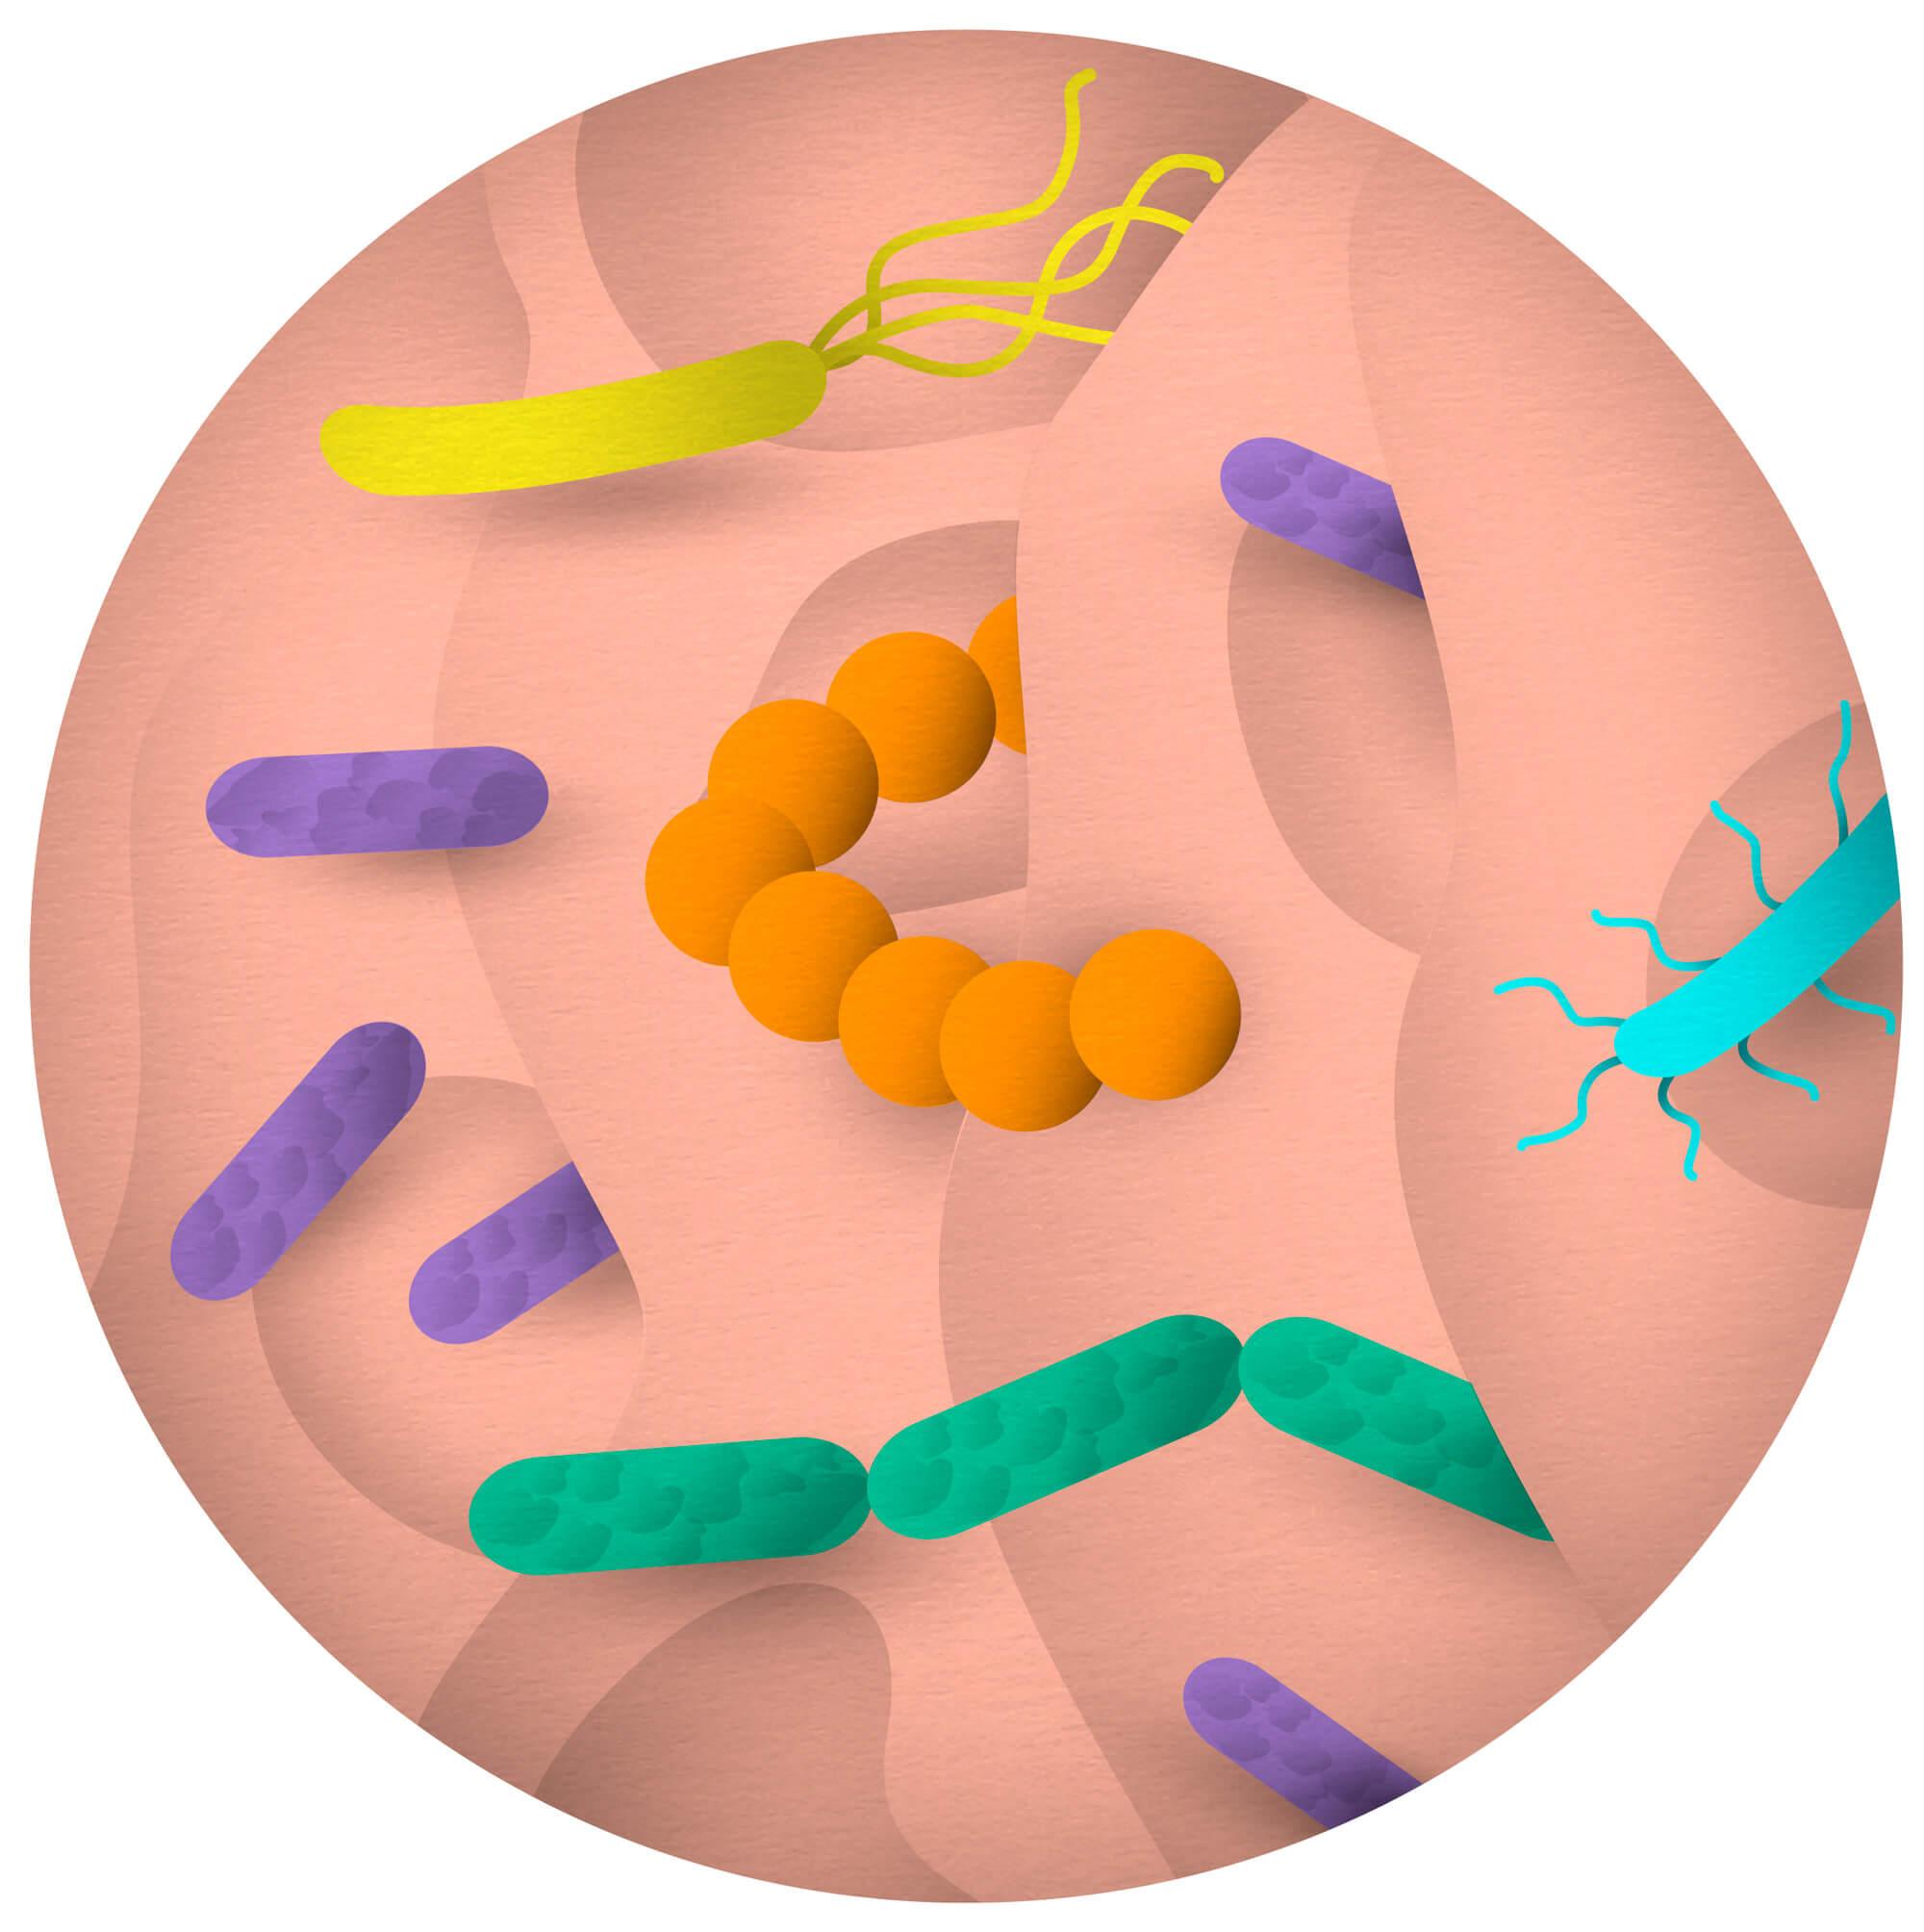 bacteria_vigo_illustration_katrinrodegast_web